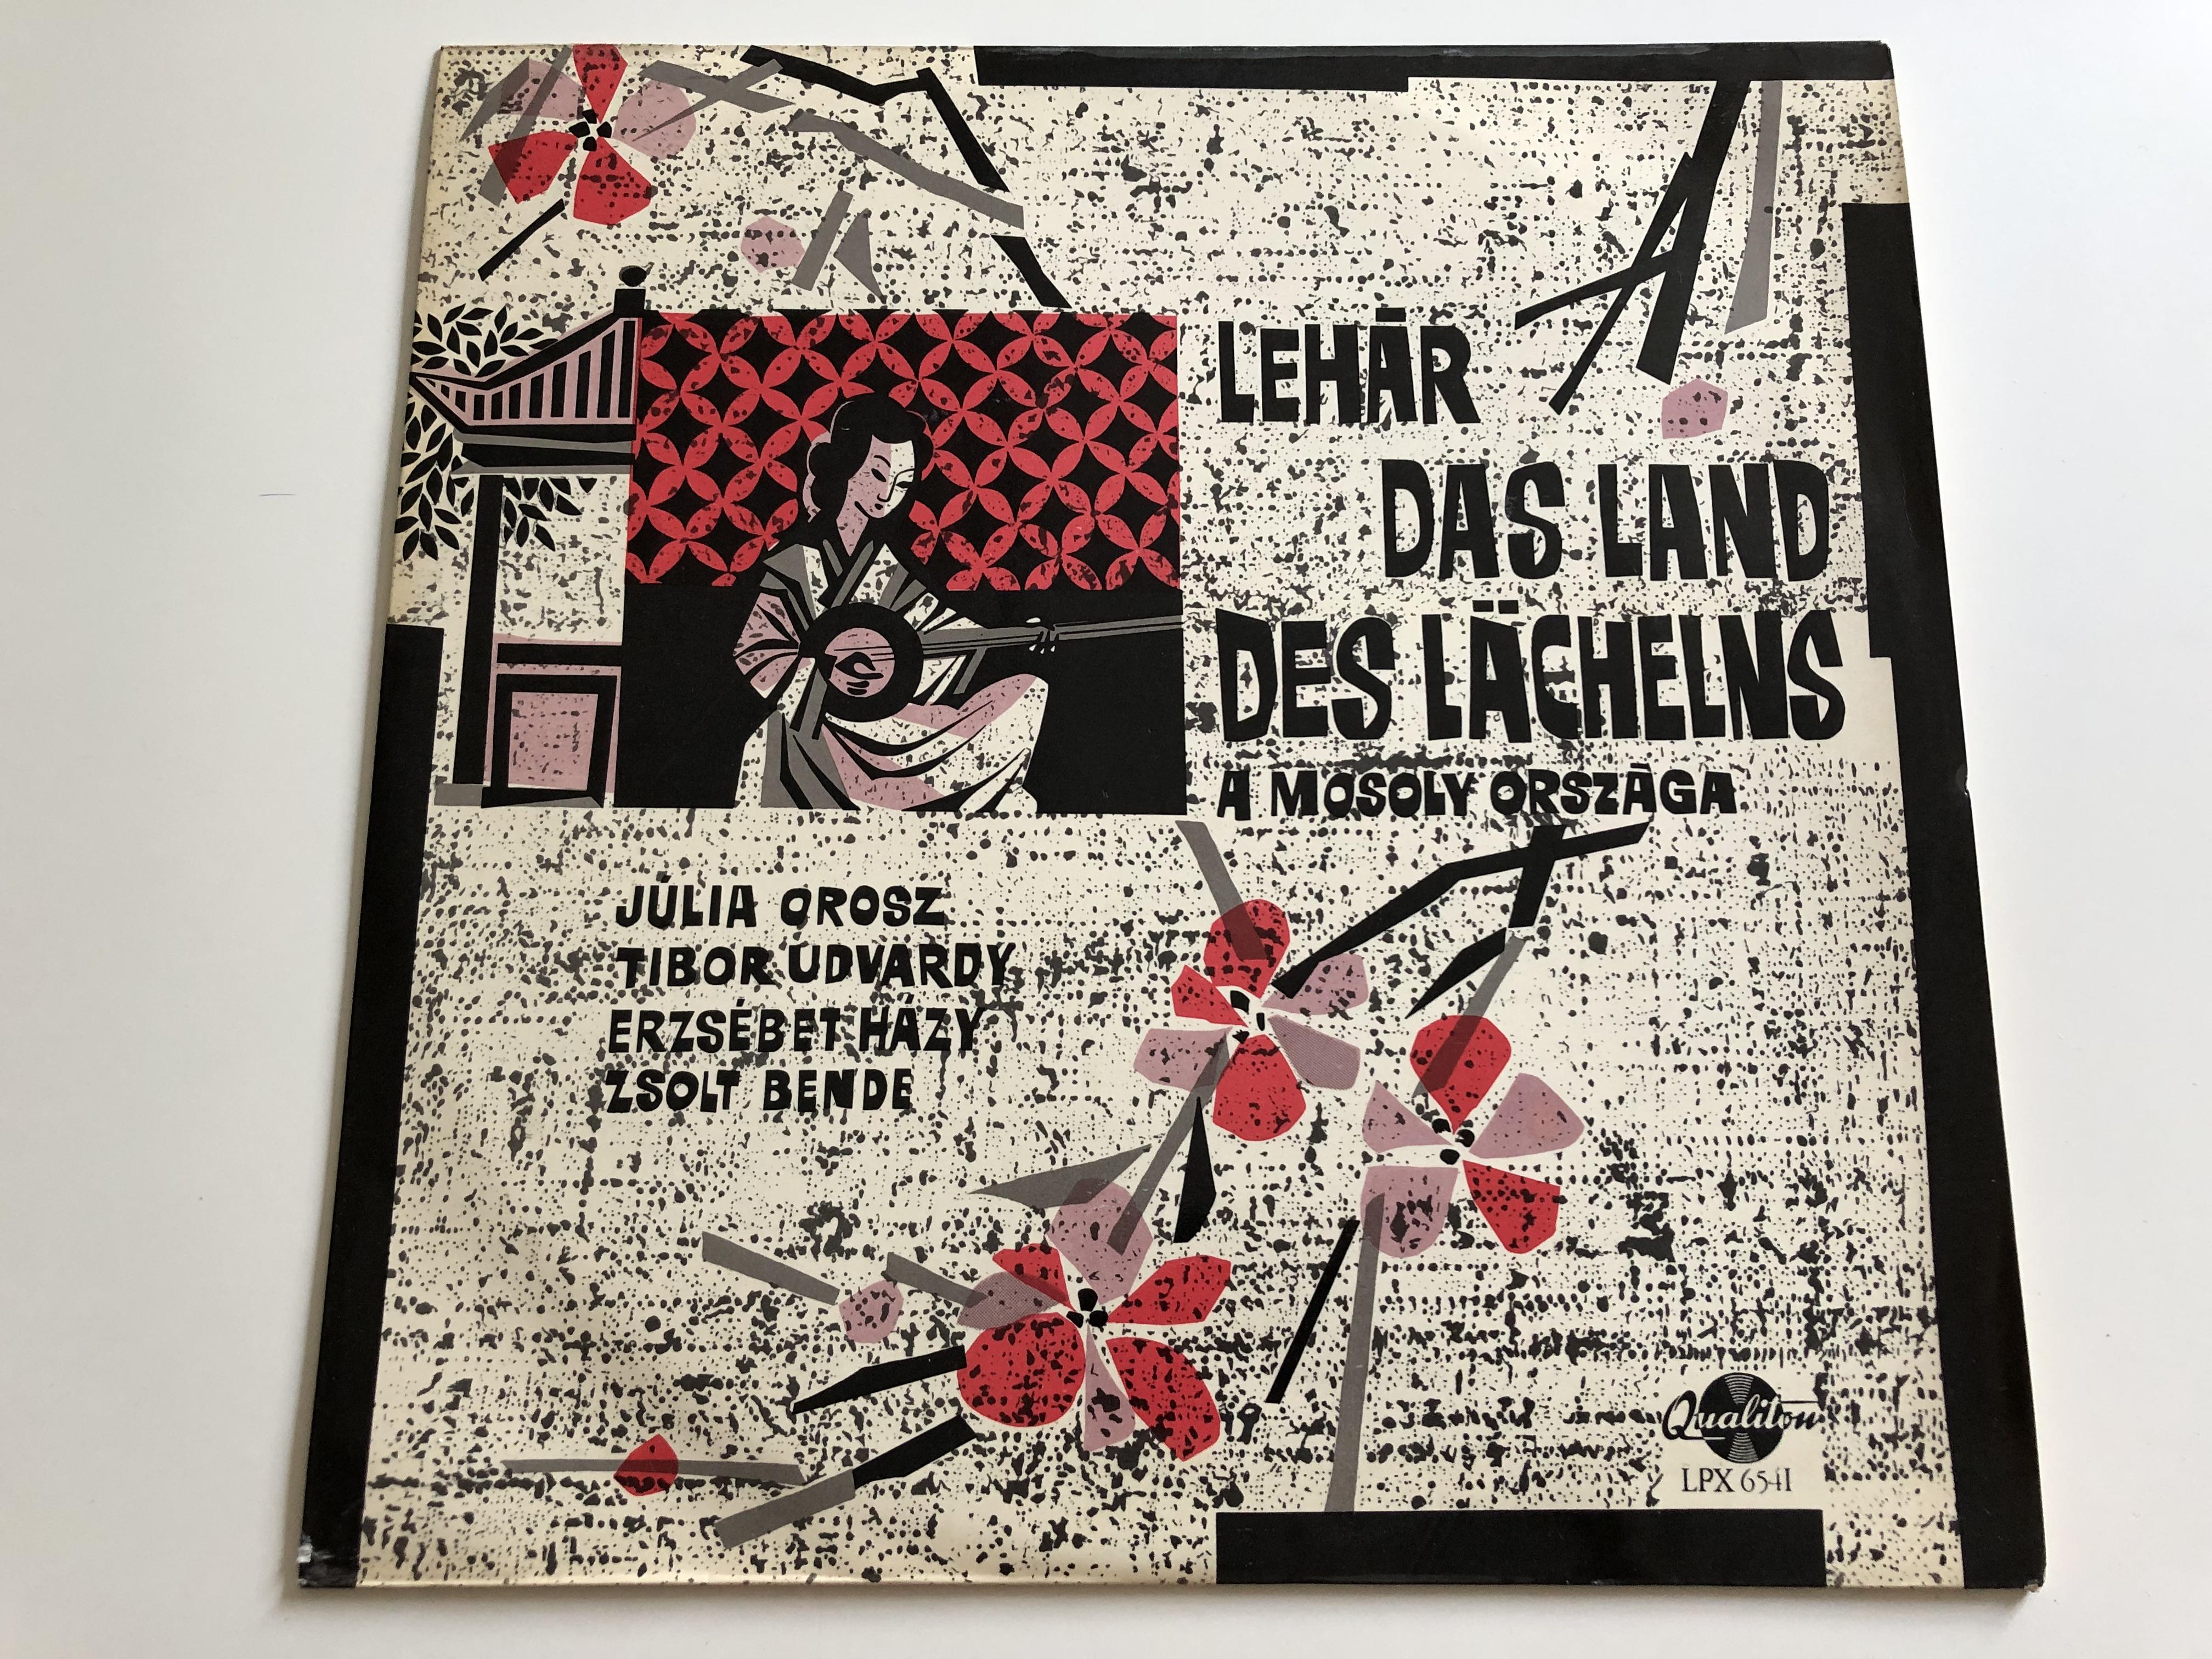 leh-r-das-land-des-l-chelns-a-mosoly-orsz-ga-j-lia-orosz-tibor-udvardy-erzs-bet-h-zy-zsolt-bende-qualiton-lp-stereo-mono-lpx-6541-1-.jpg